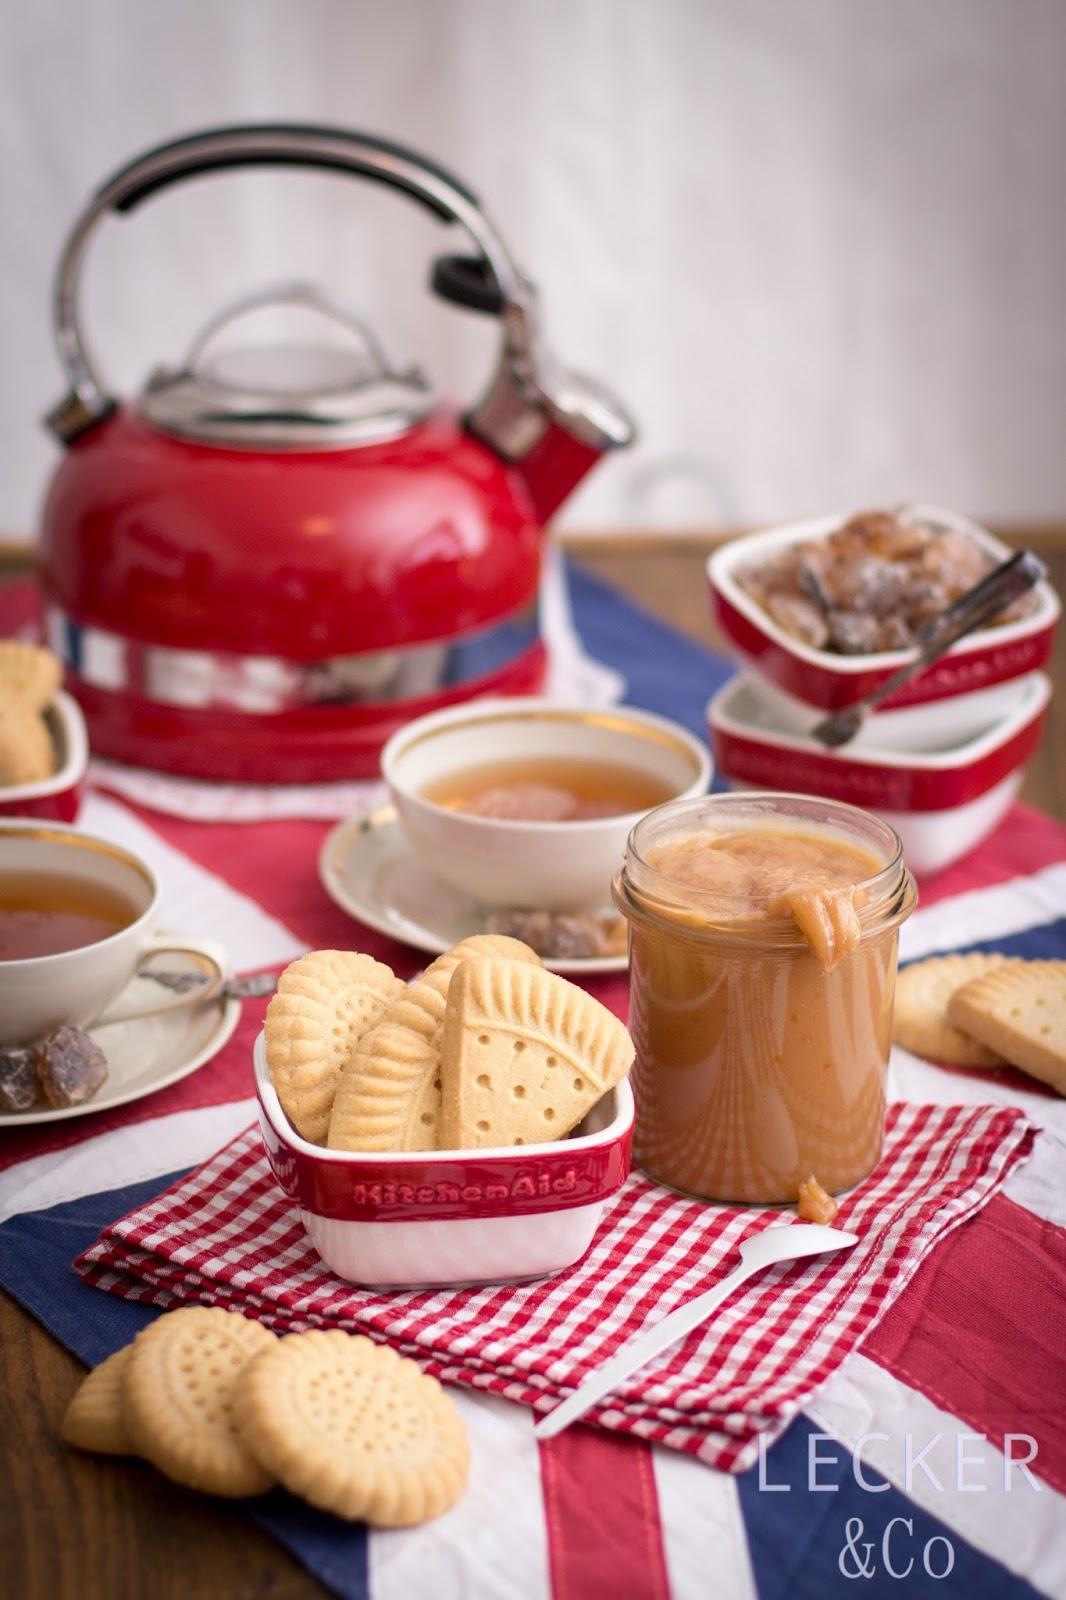 lecker co foodblog aus n rnberg christmas fudge im glas 1 advent mit kitchen aid. Black Bedroom Furniture Sets. Home Design Ideas